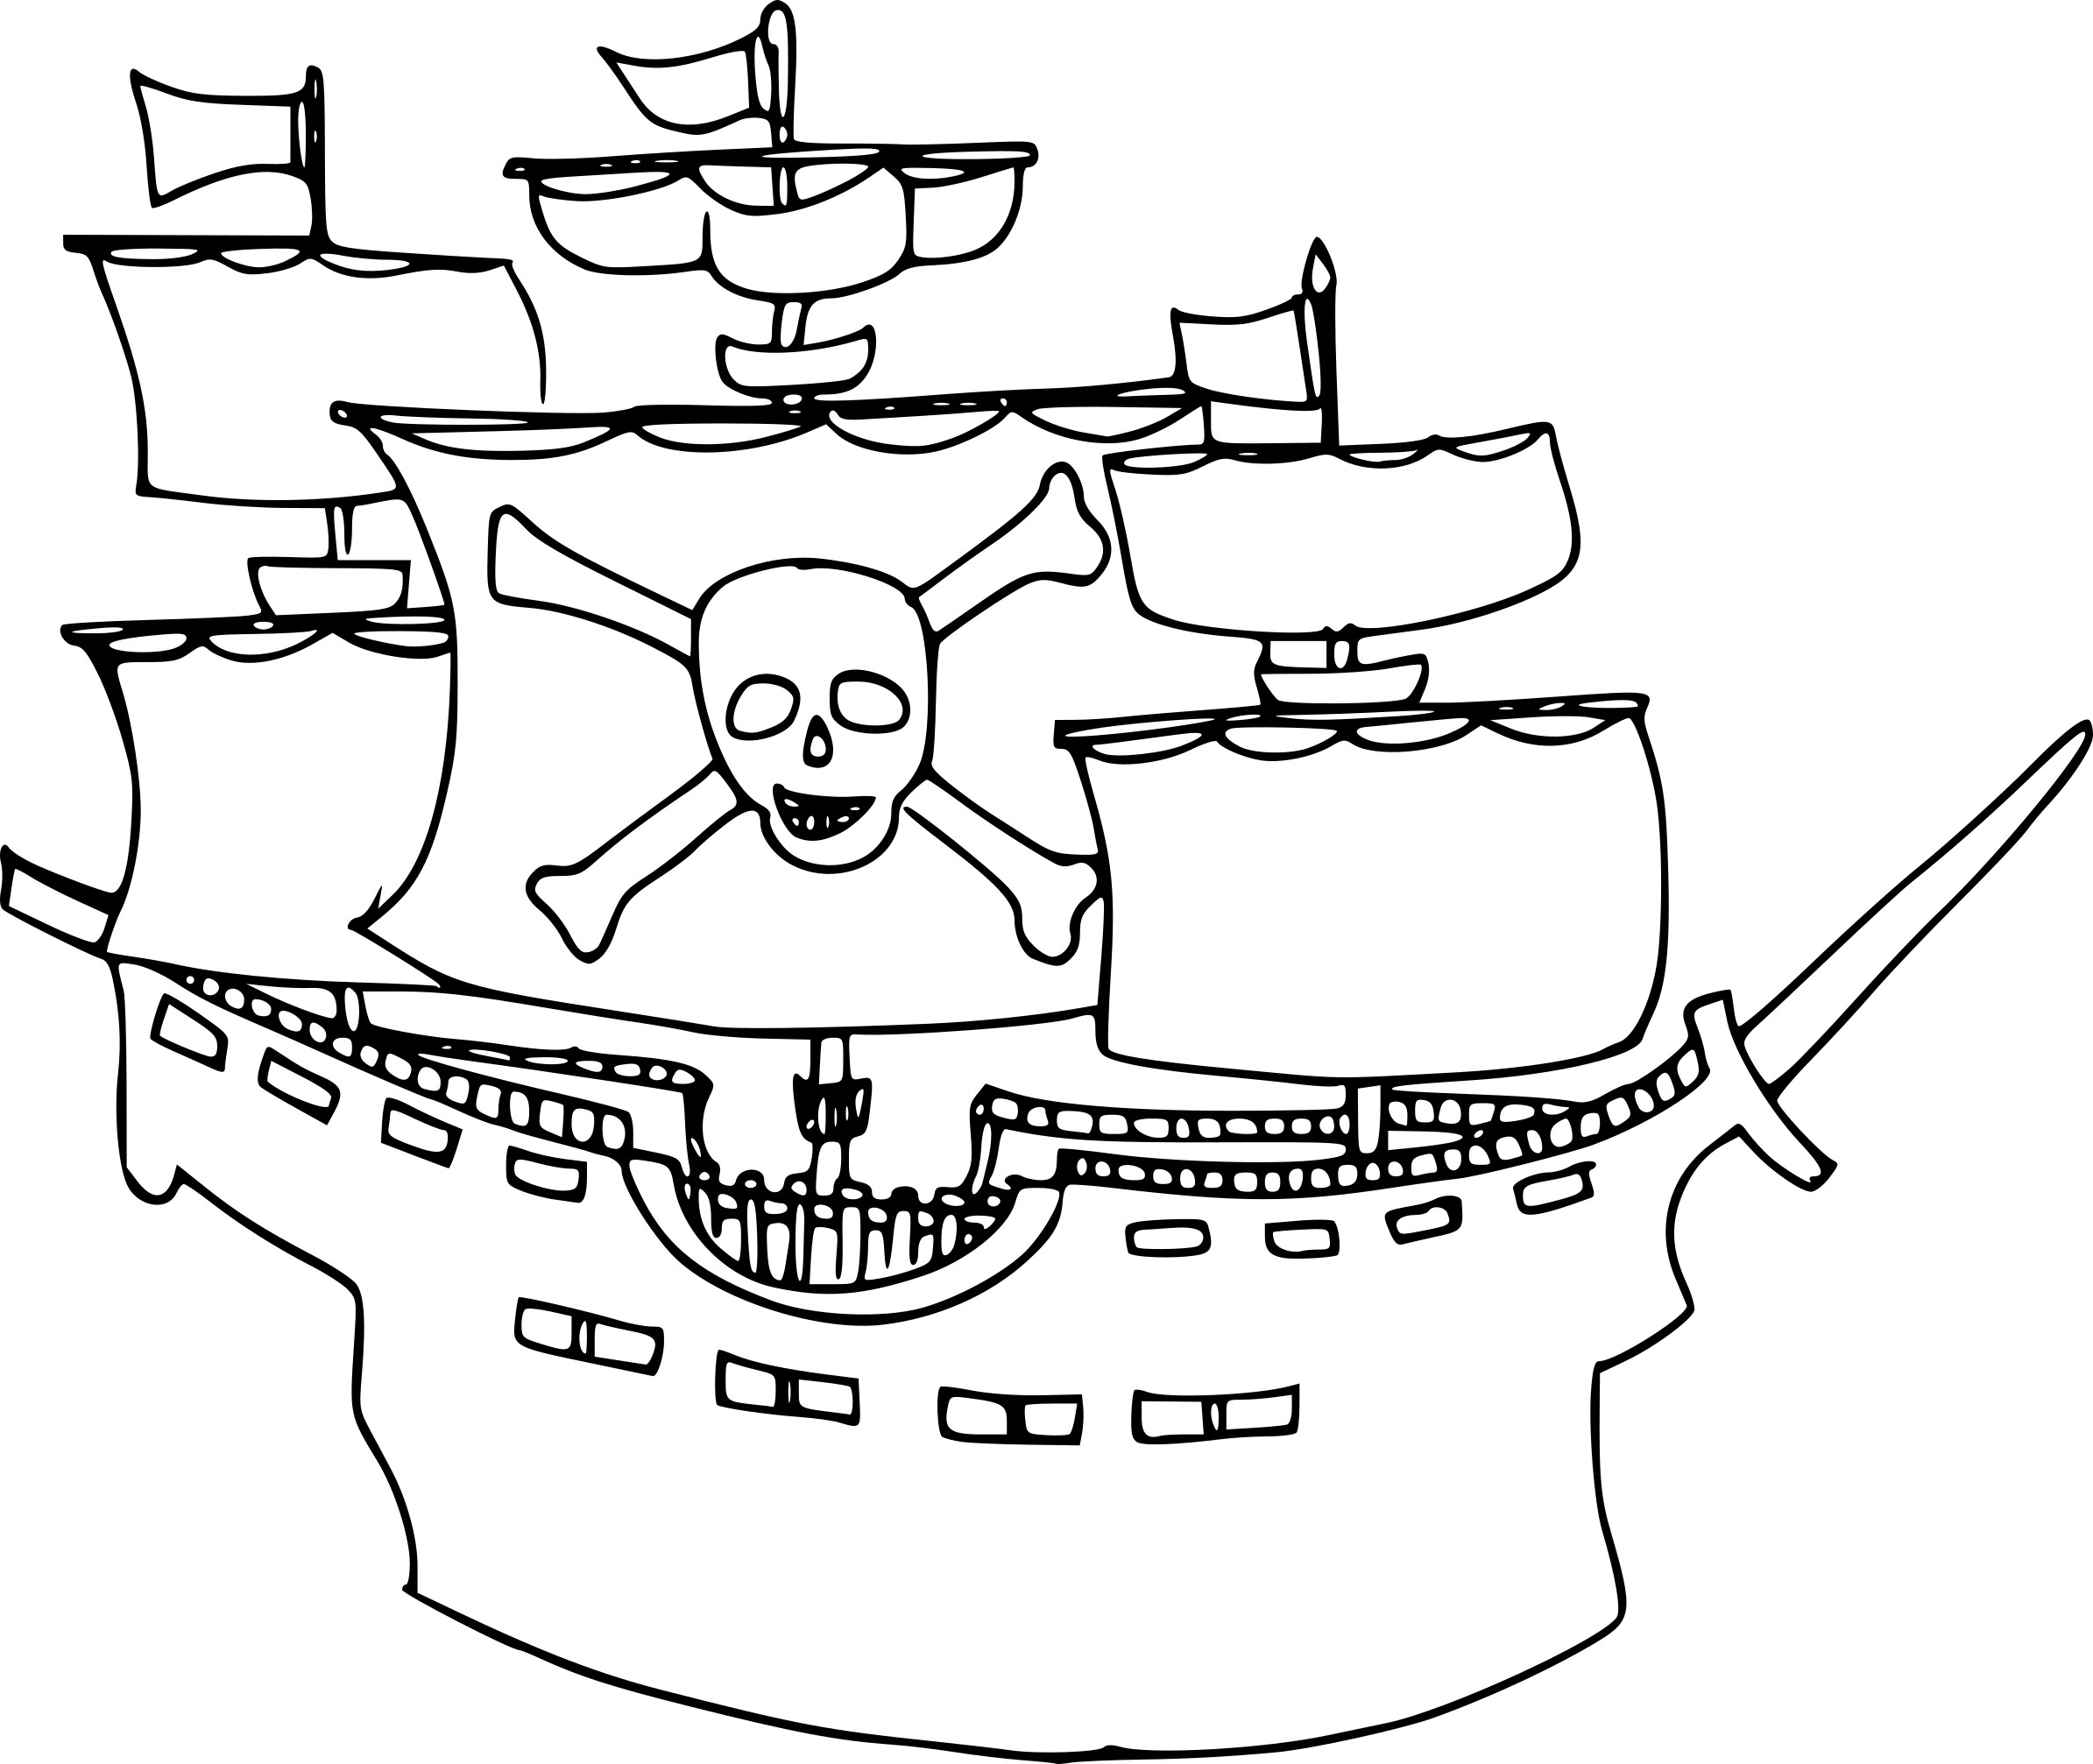 Coloriage Bateau De Pirate Dessin À Imprimer Sur Coloriages concernant Dessin A Imprimer De Pirate